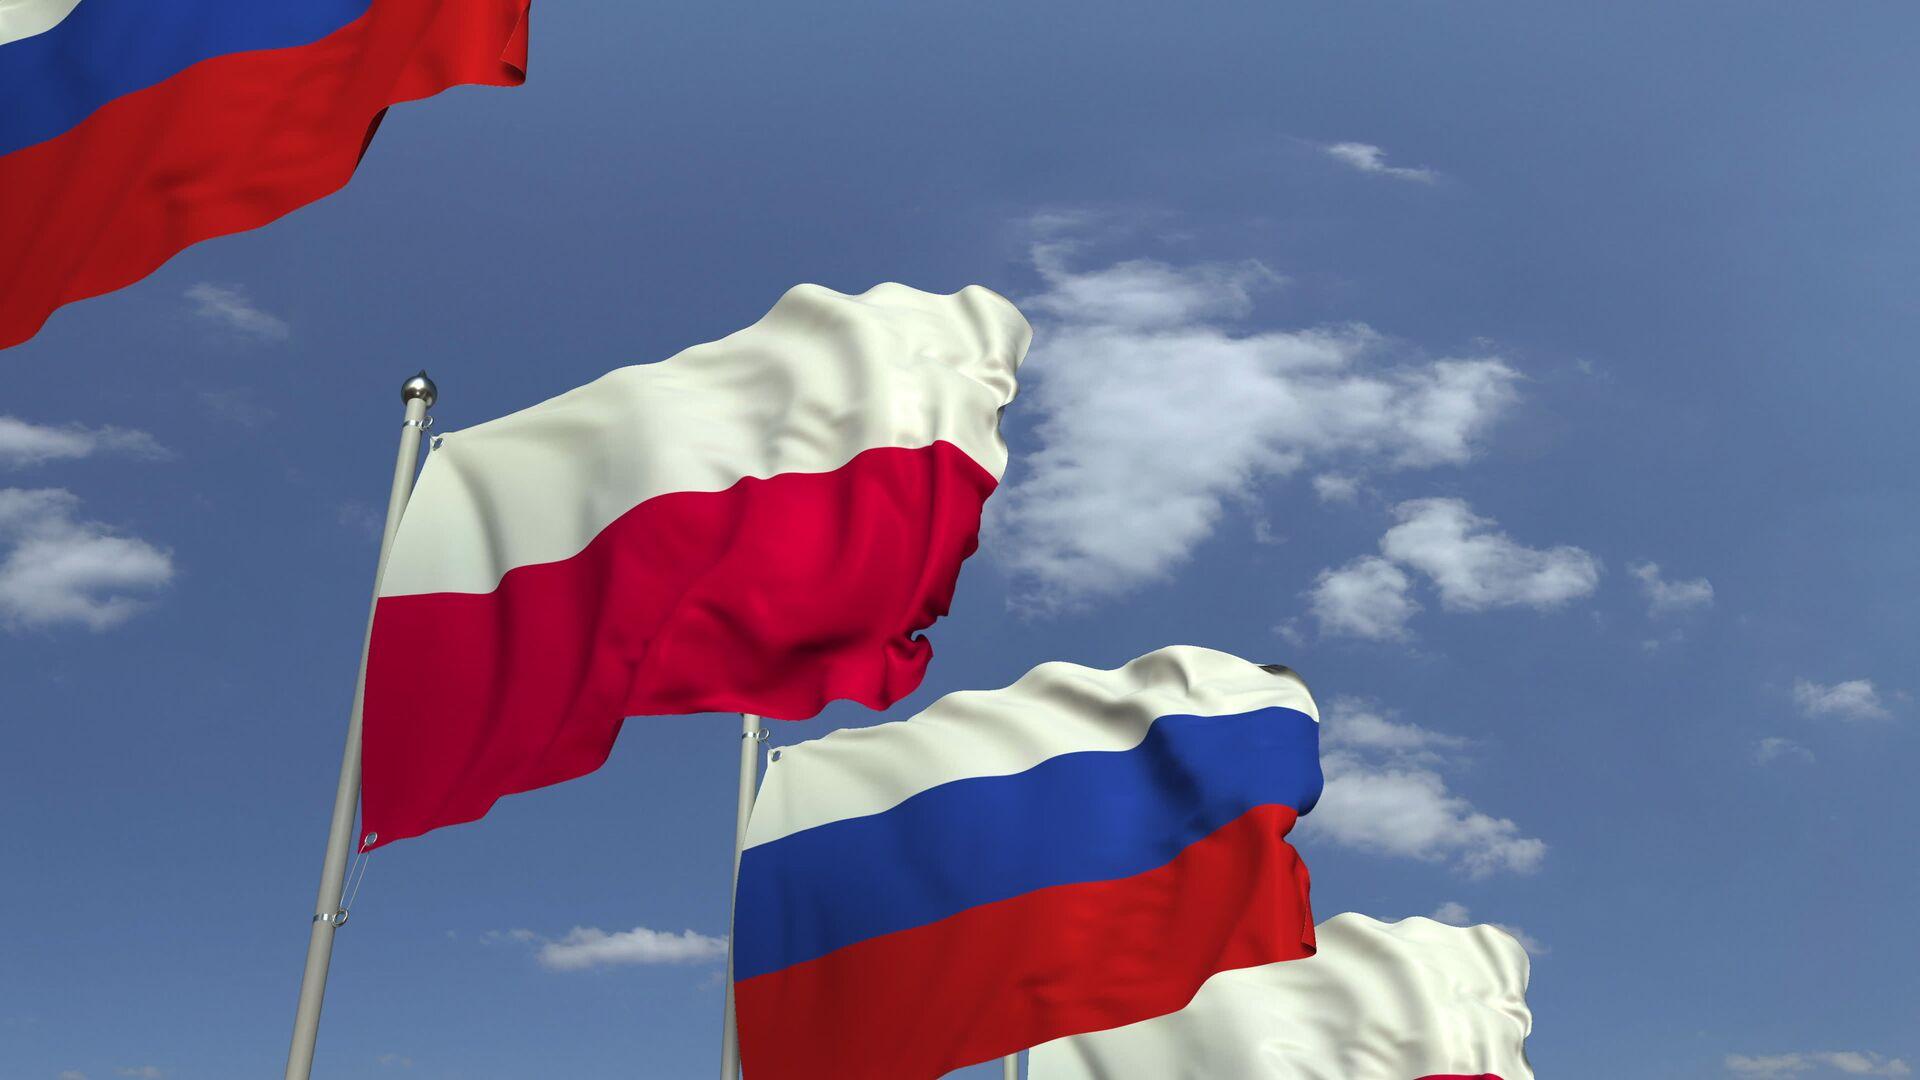 Flagi Rosji i Polski - Sputnik Polska, 1920, 27.05.2021